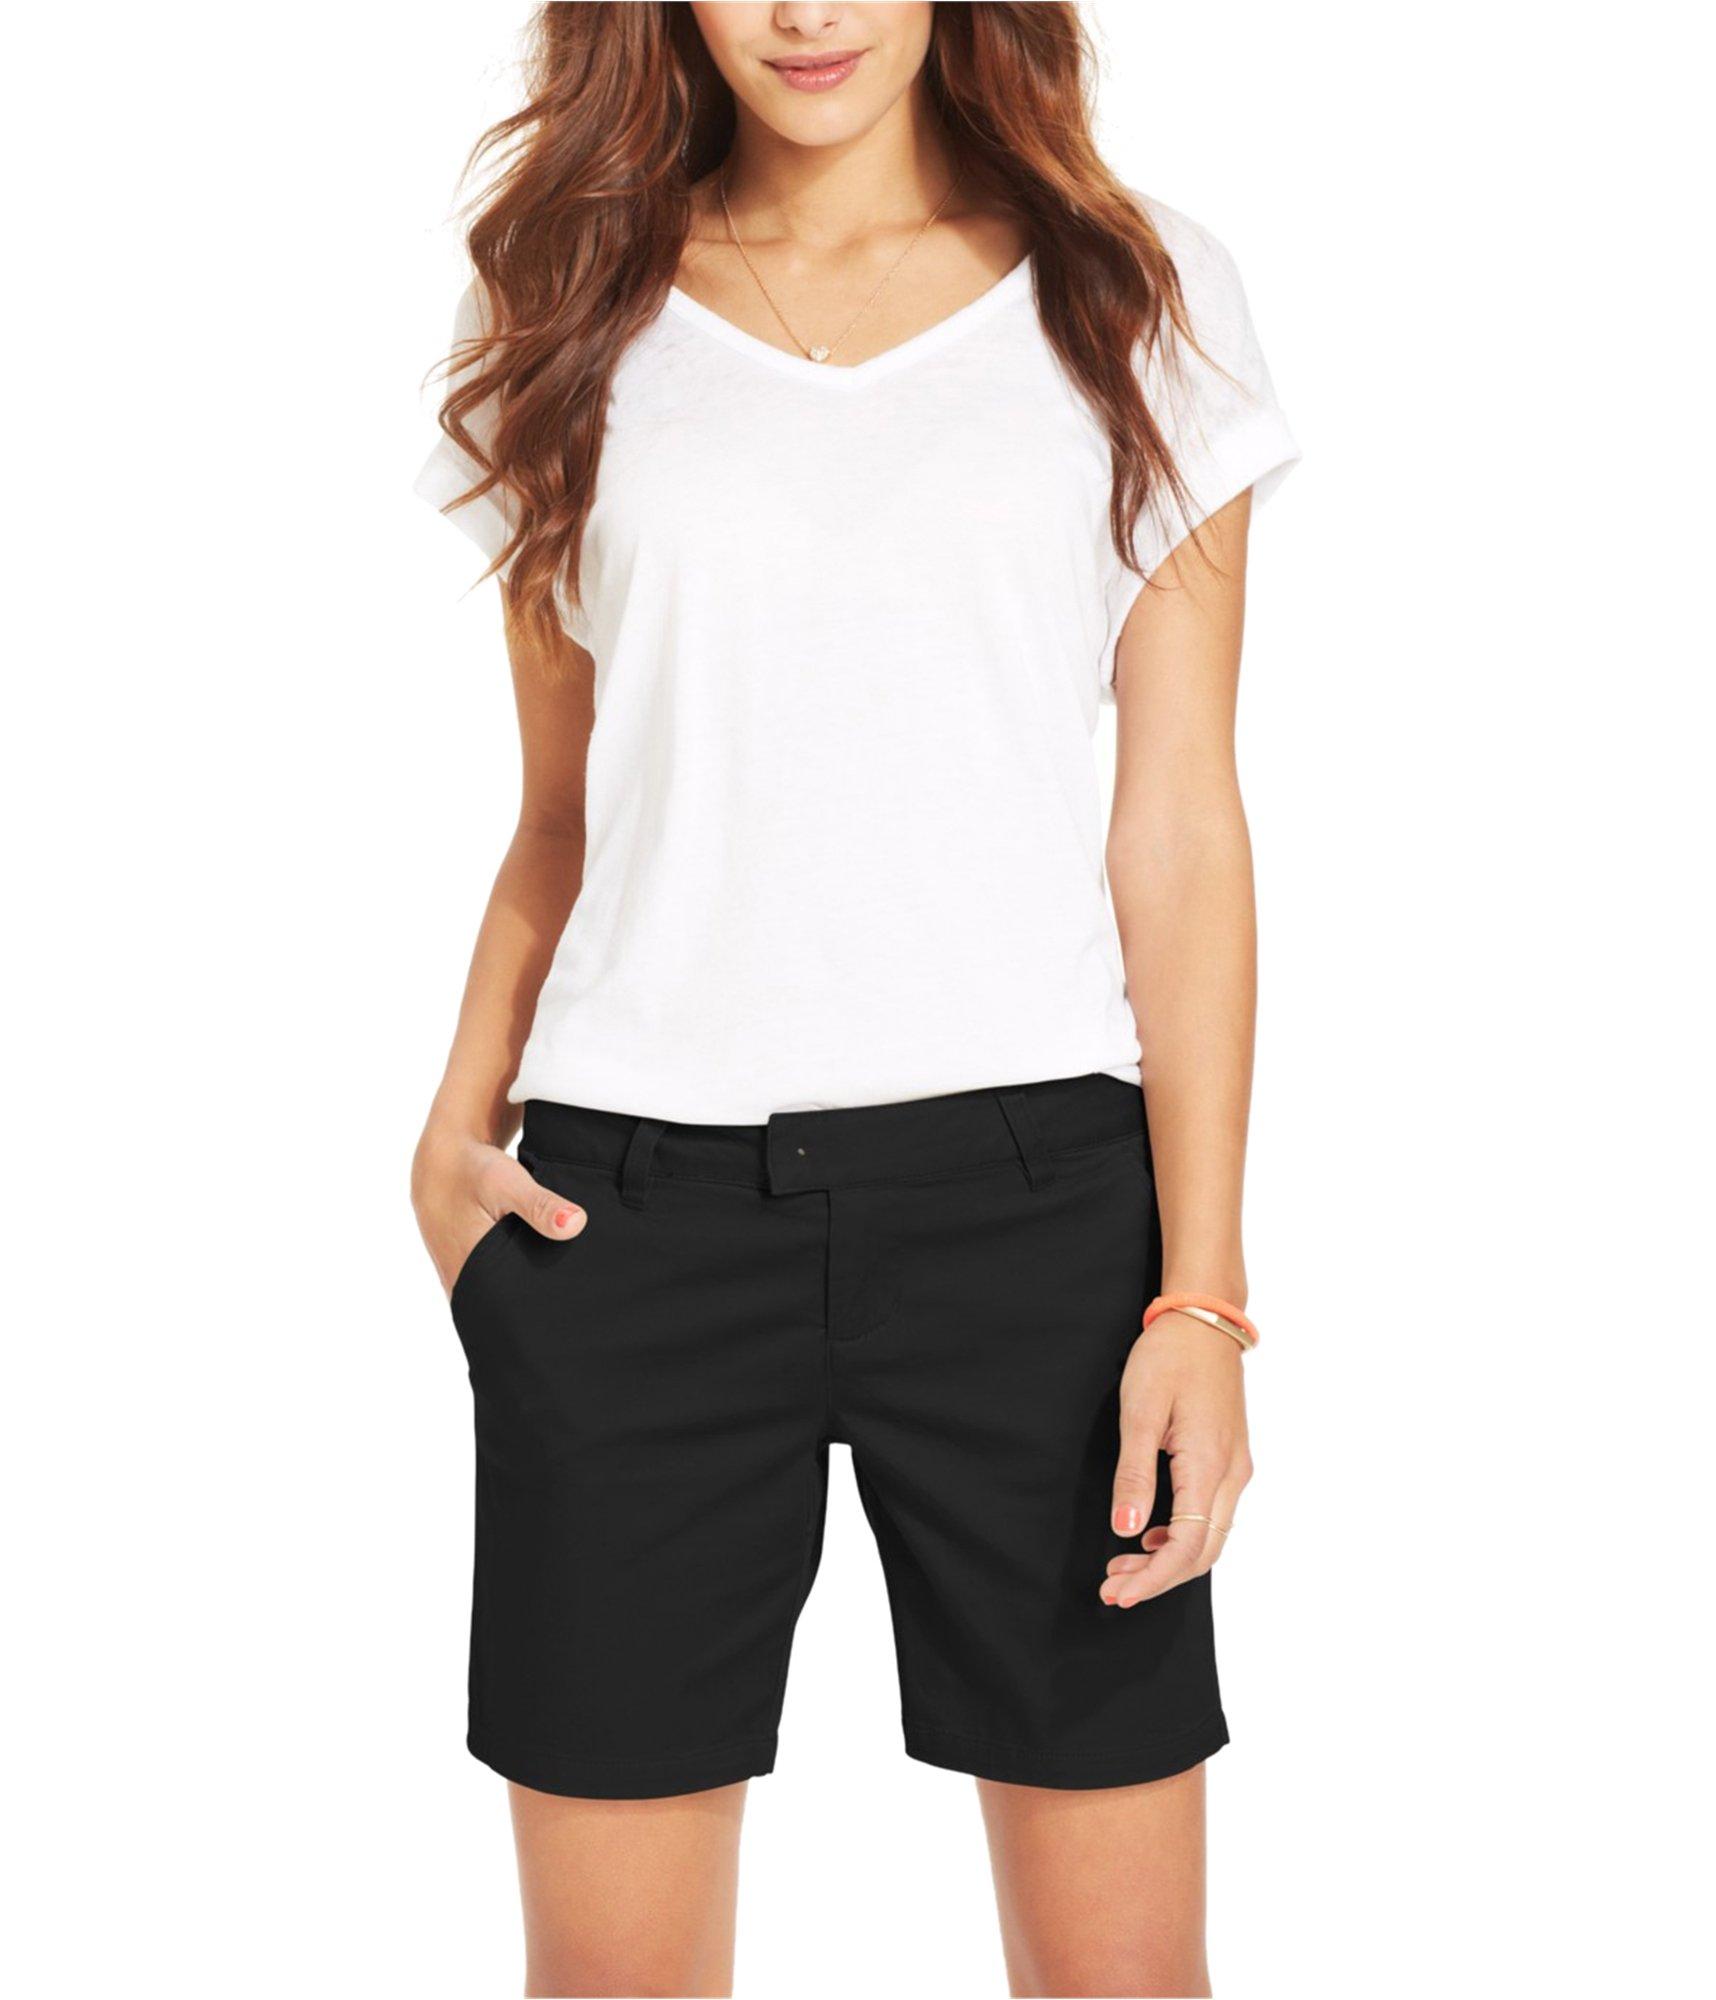 Volcom Womens Frochickie 2.5 inch Casual Chino Shorts Black 13 - Juniors